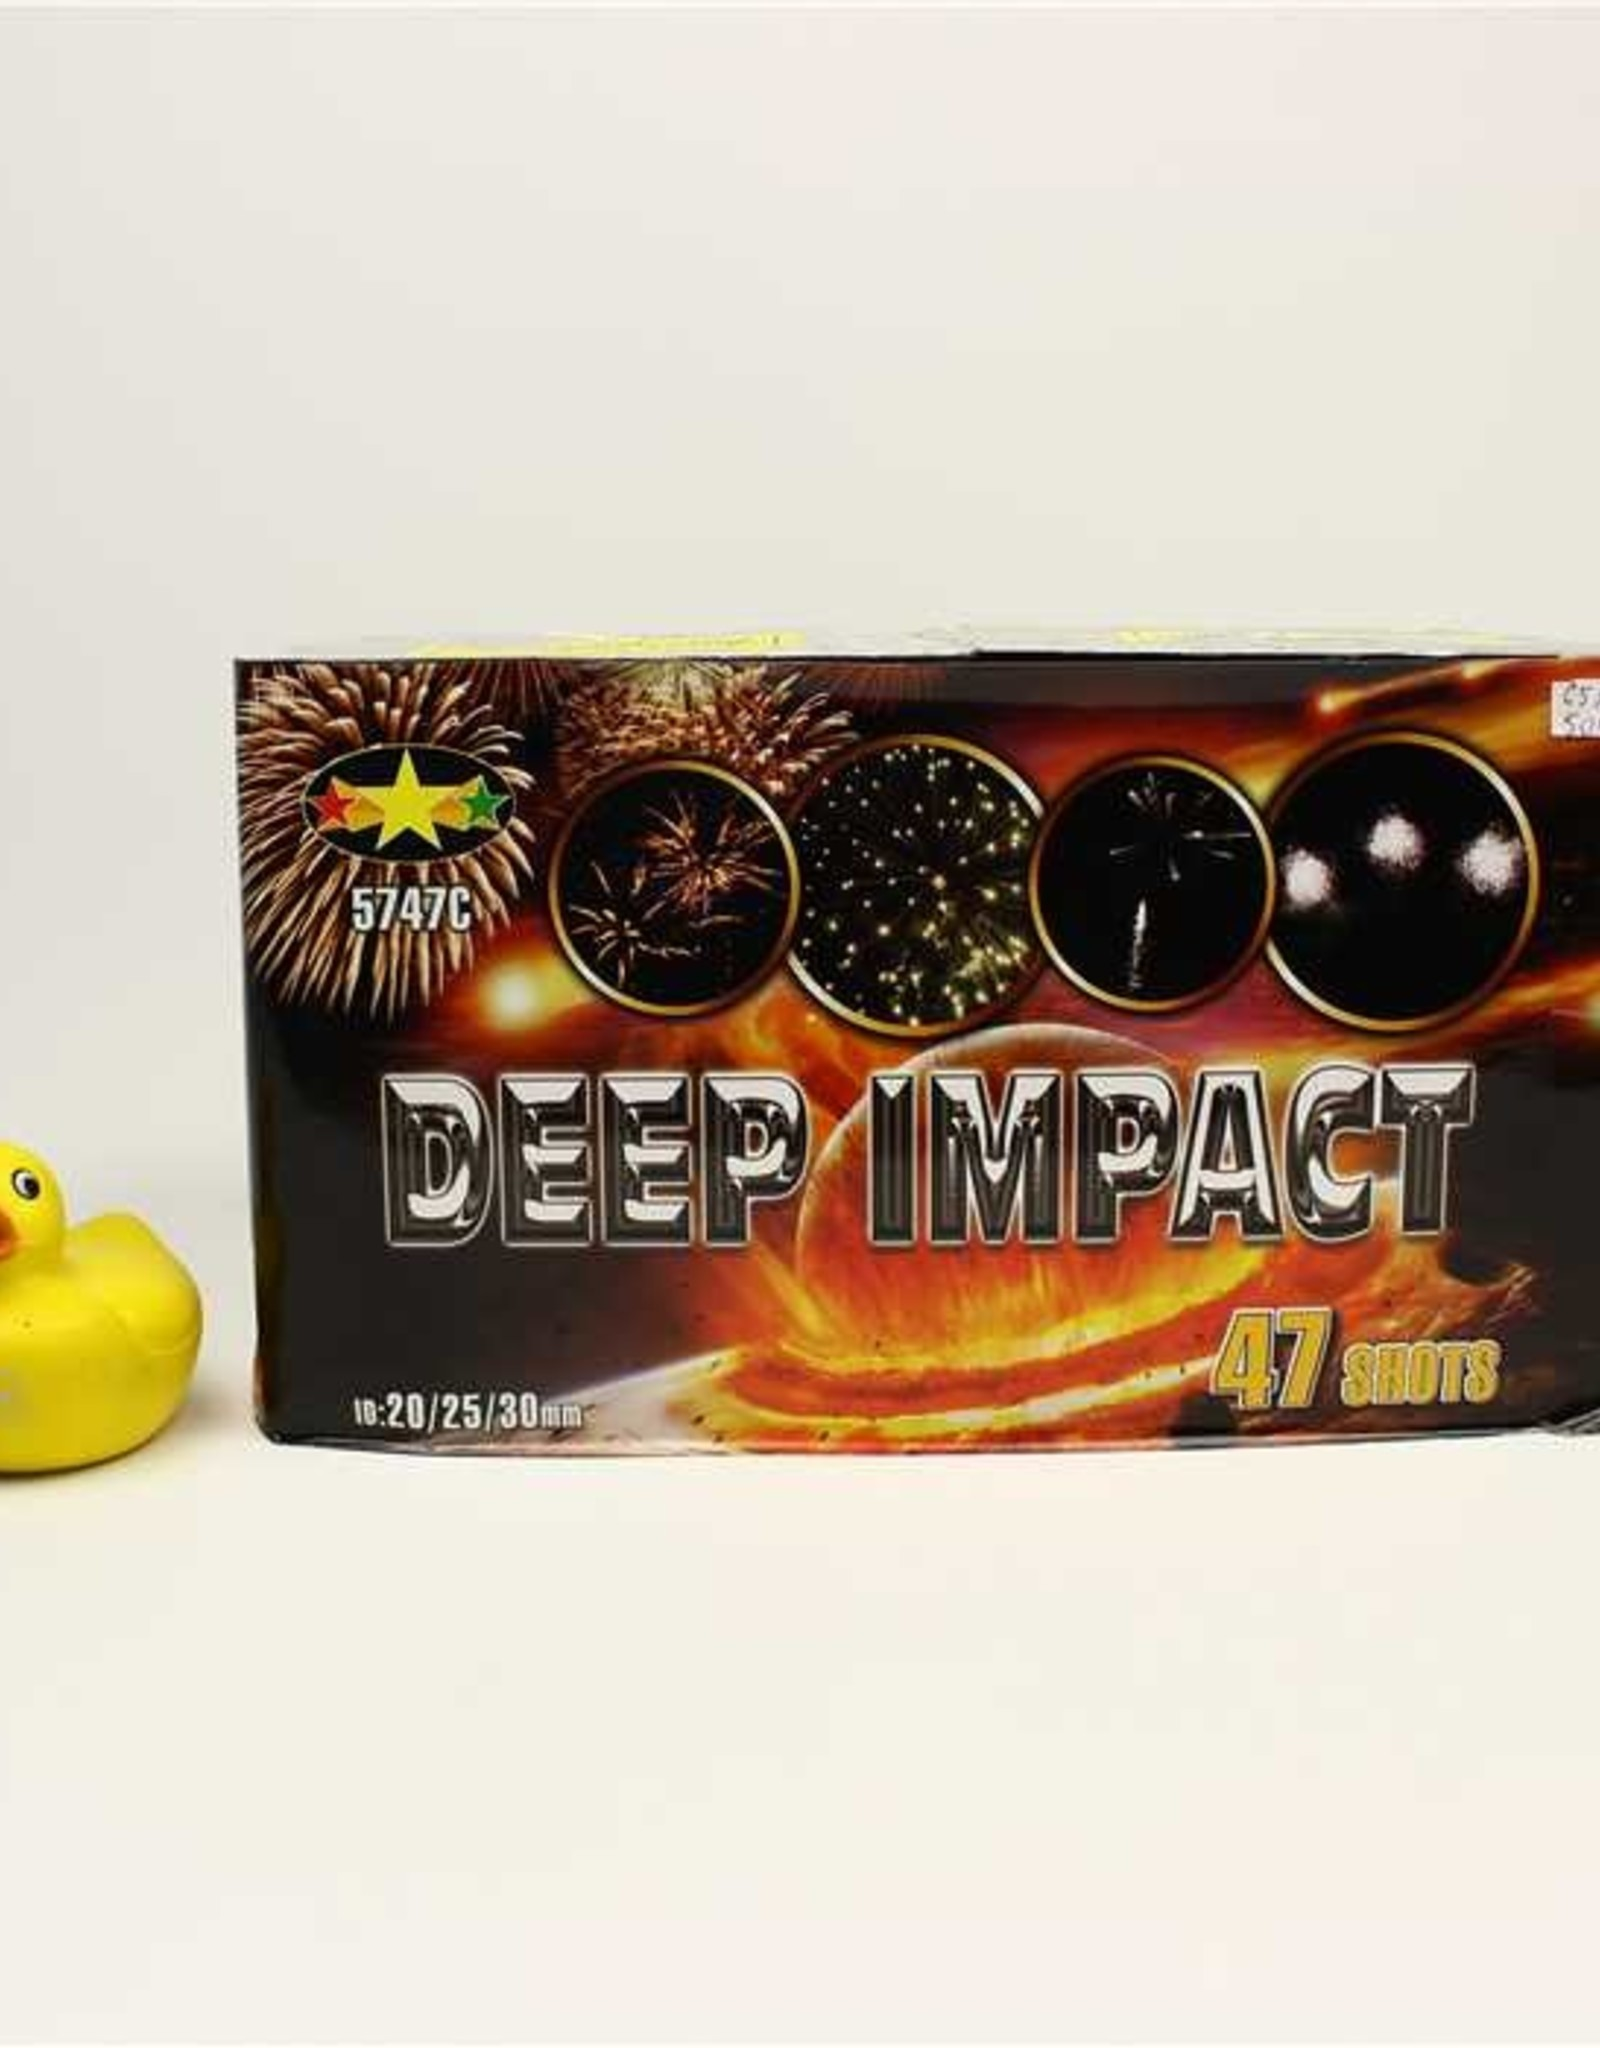 TRISTAR Deep impact 47 shot